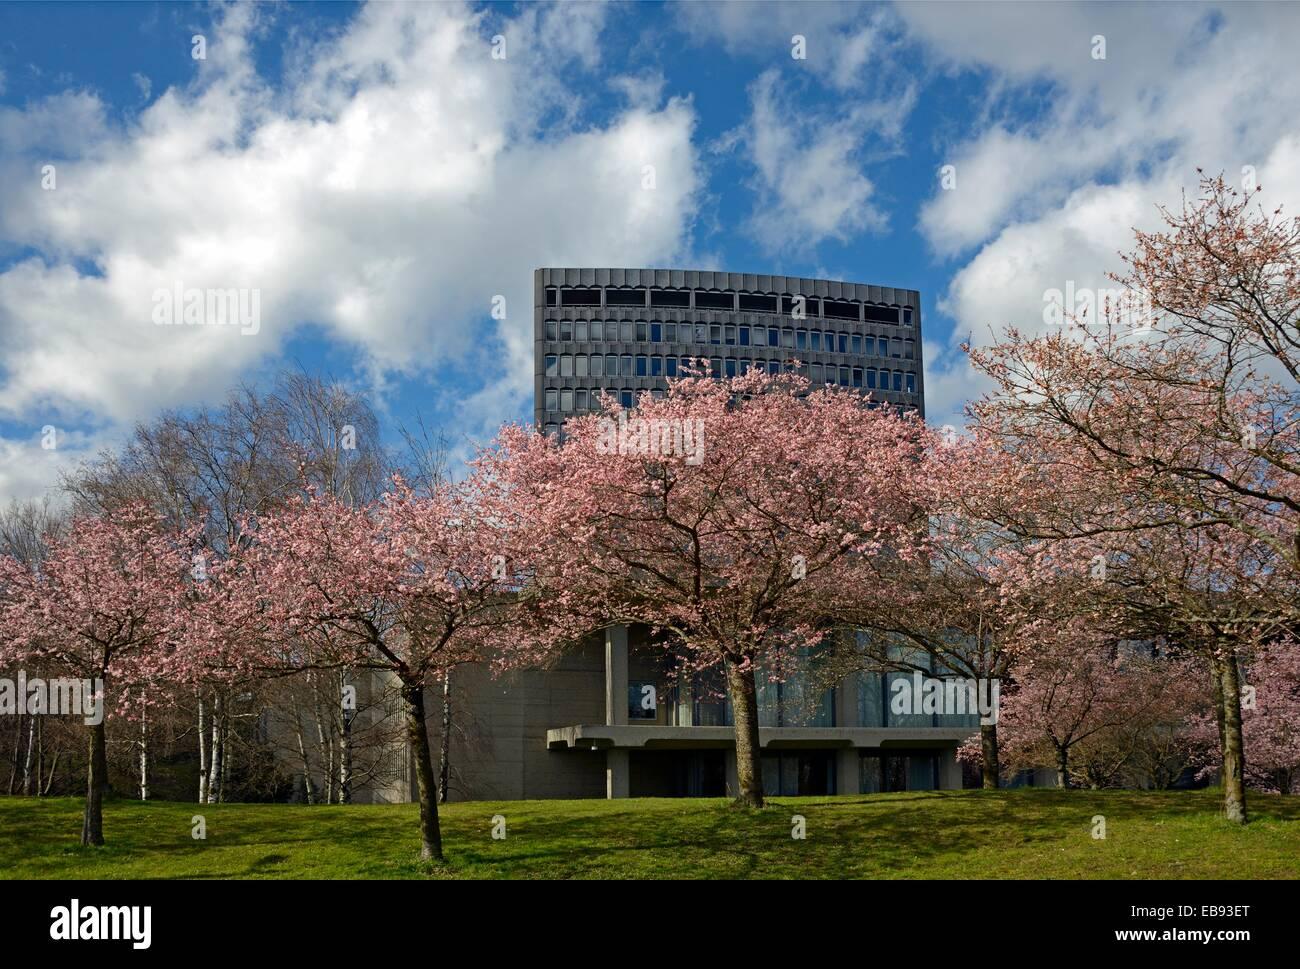 ILO, International Labor Office, spring, Geneva, Switzerland. - Stock Image